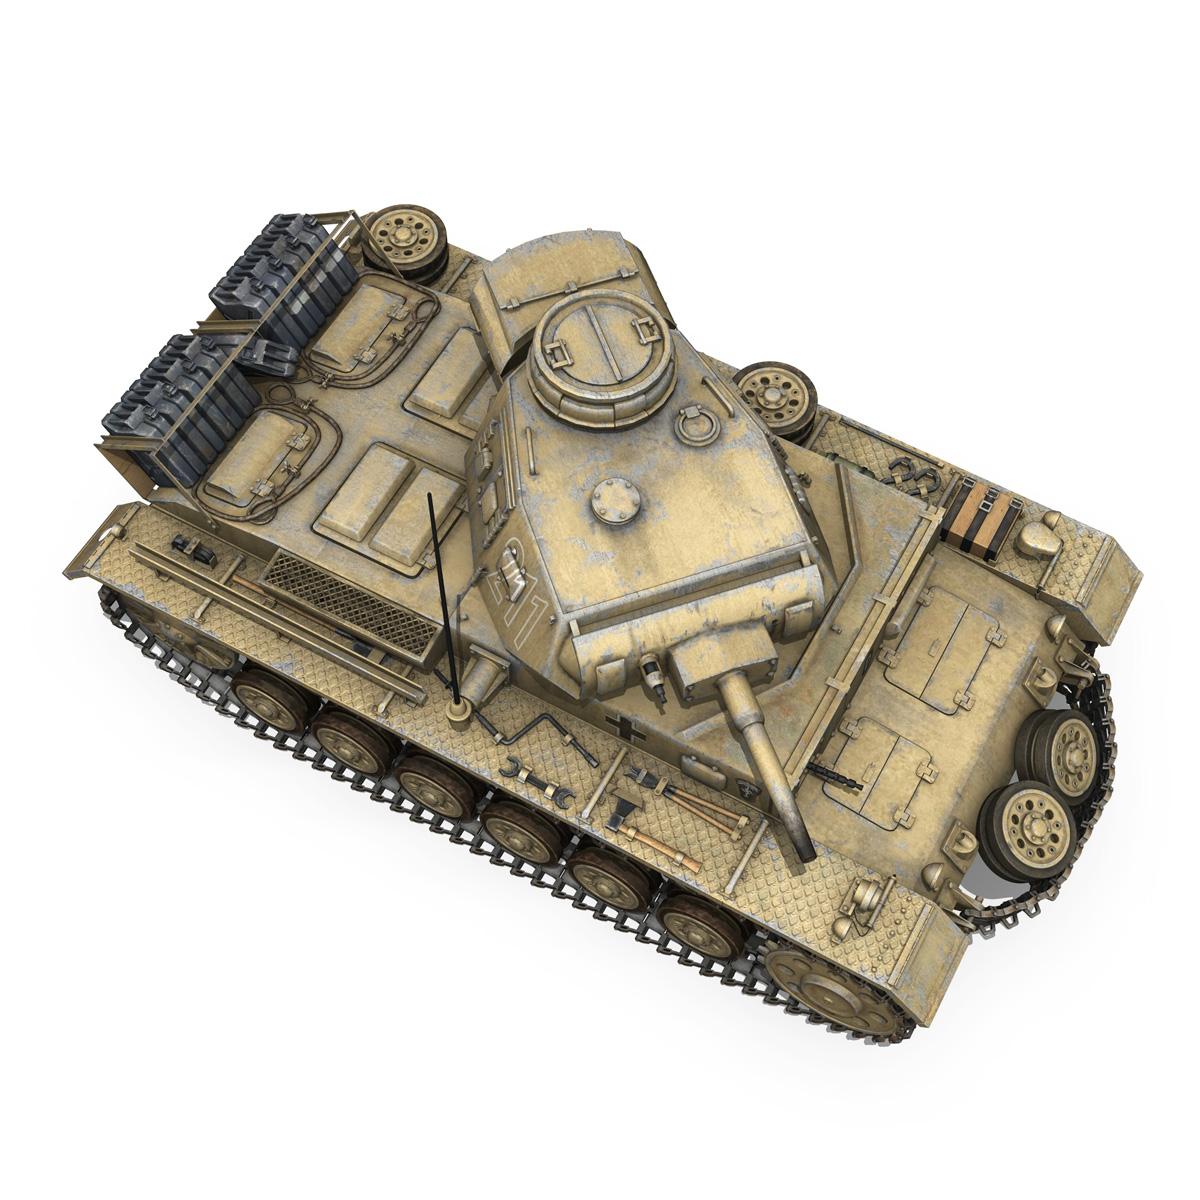 pzkpfw iii – panzer 3 – ausf.g – dak – 211 3d model 3ds c4d fbx lwo lw lws obj 266471